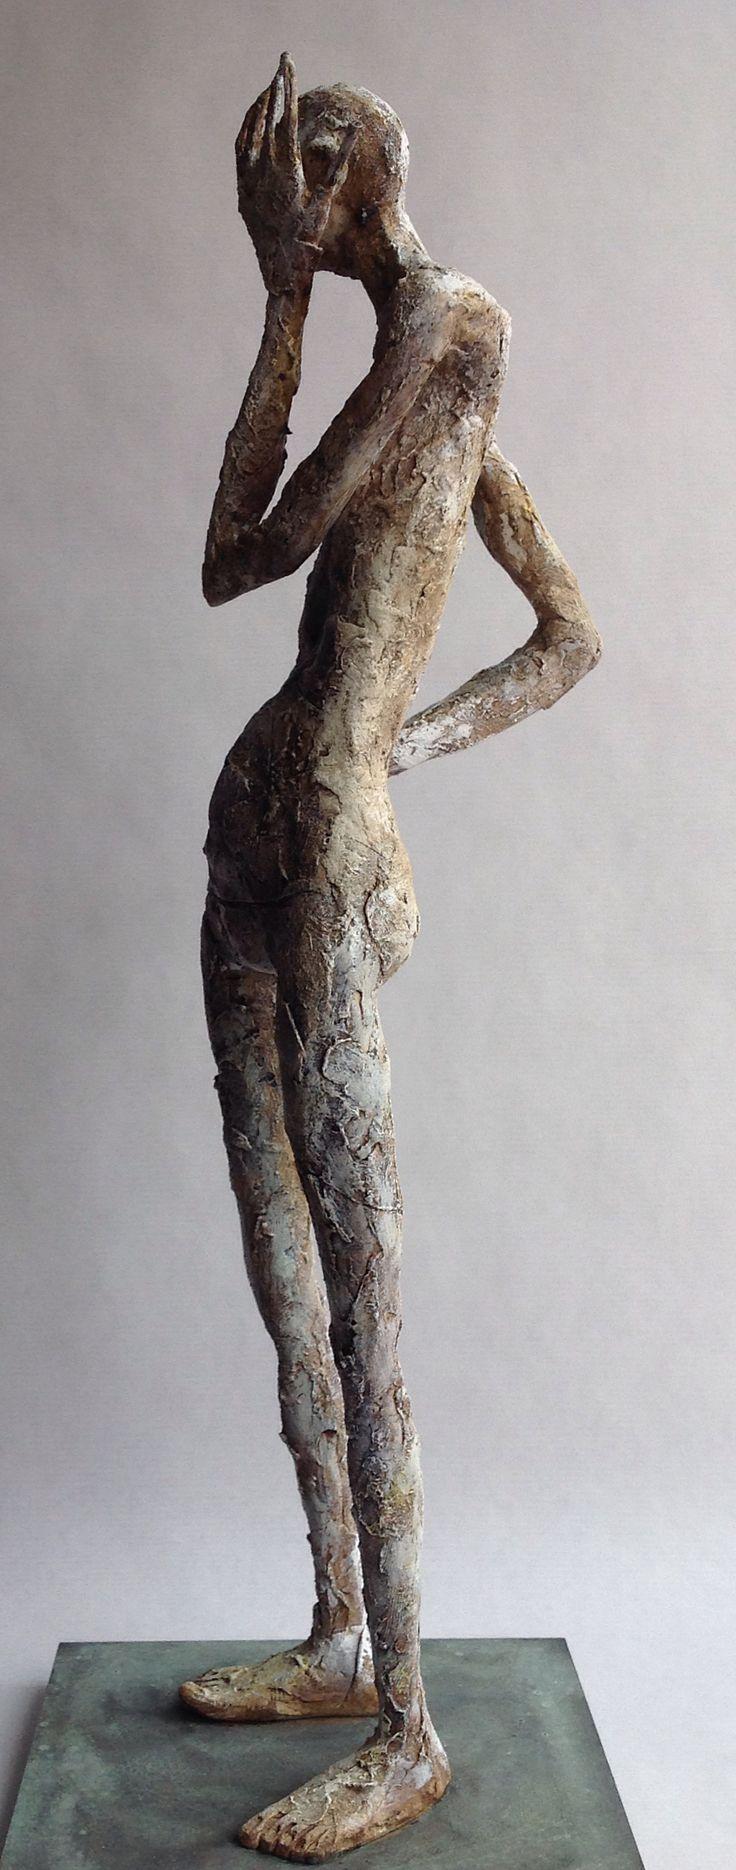 Figura Ma325. 2016. Arcilla polimérica. Acrílico y barnices. Acero, madera.  45 x 15 x 15 cm. http://www.pablohuesoart.com